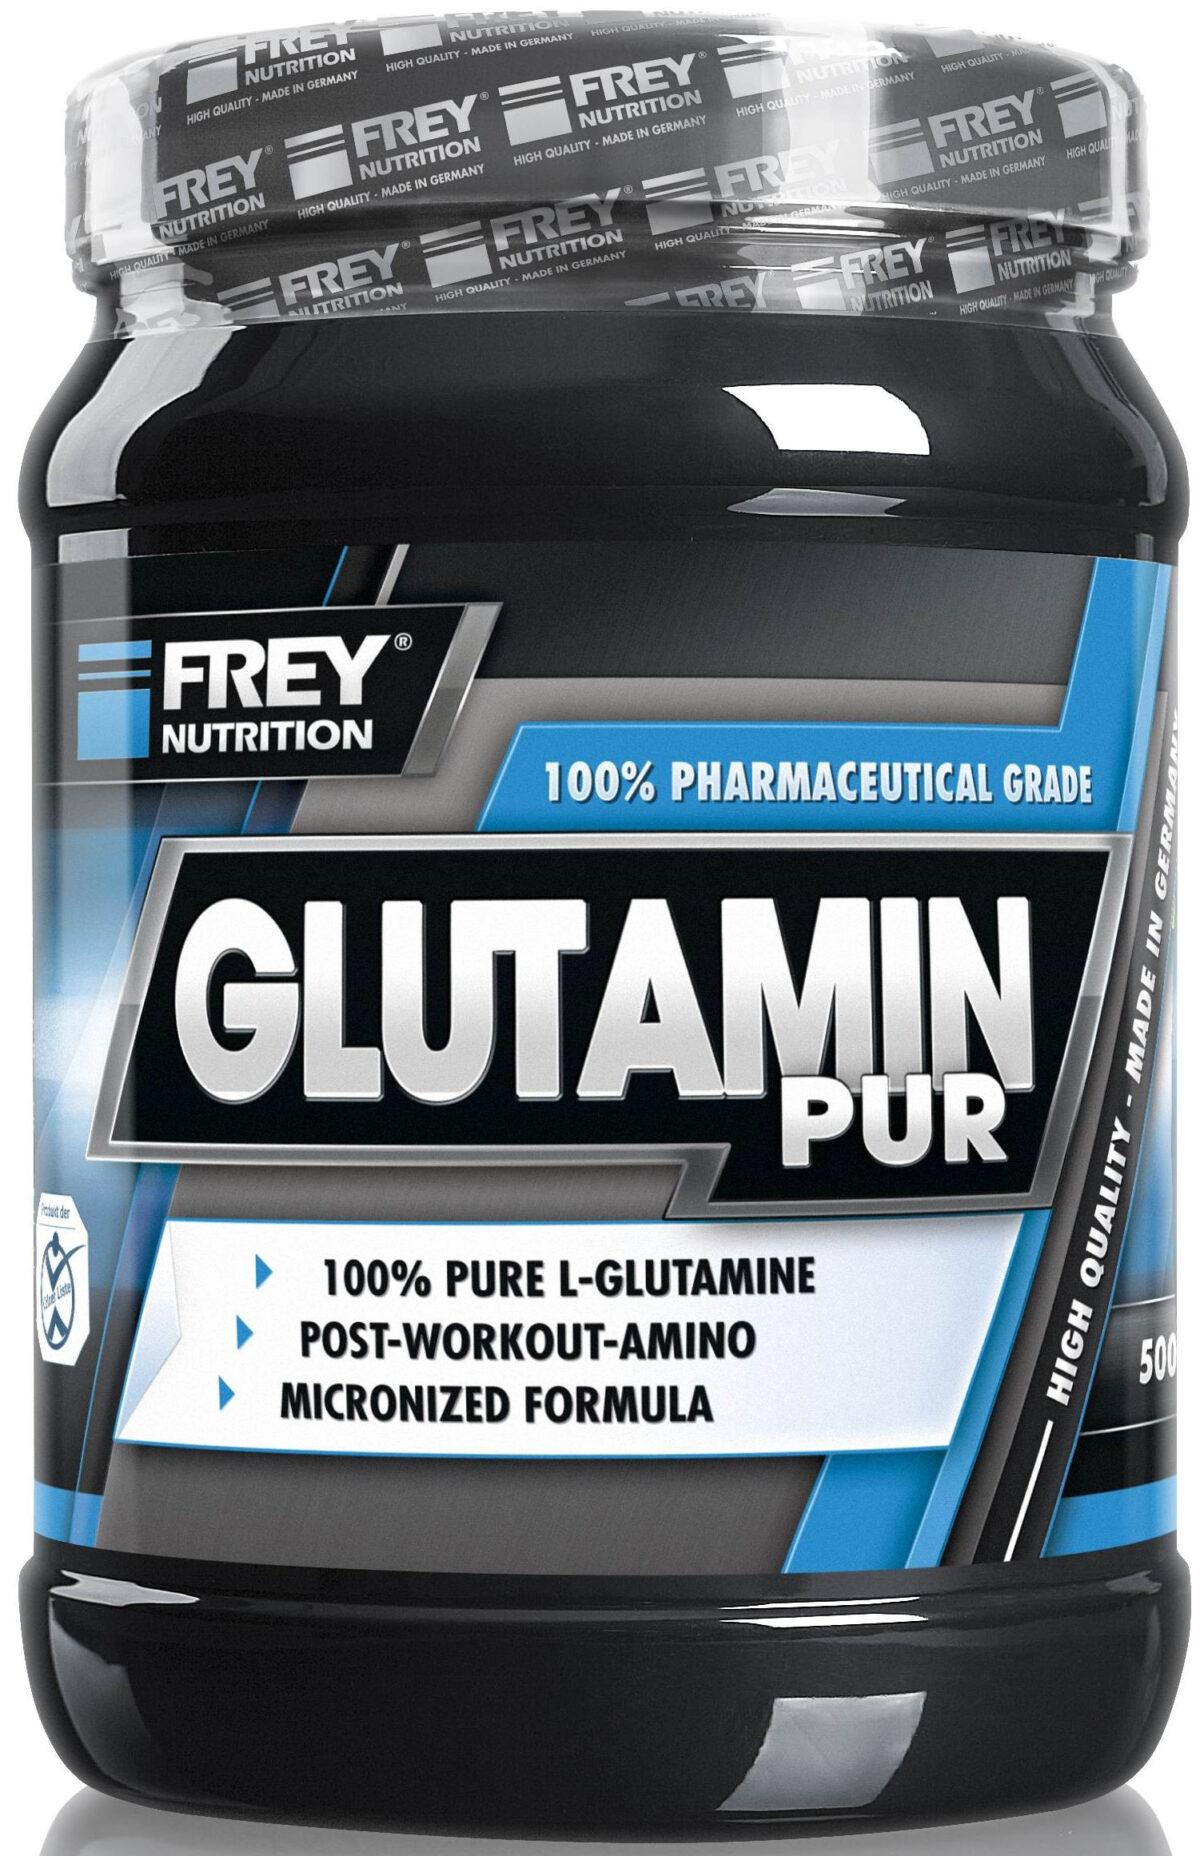 Frey Nutrition Glutamin PUR - 500g